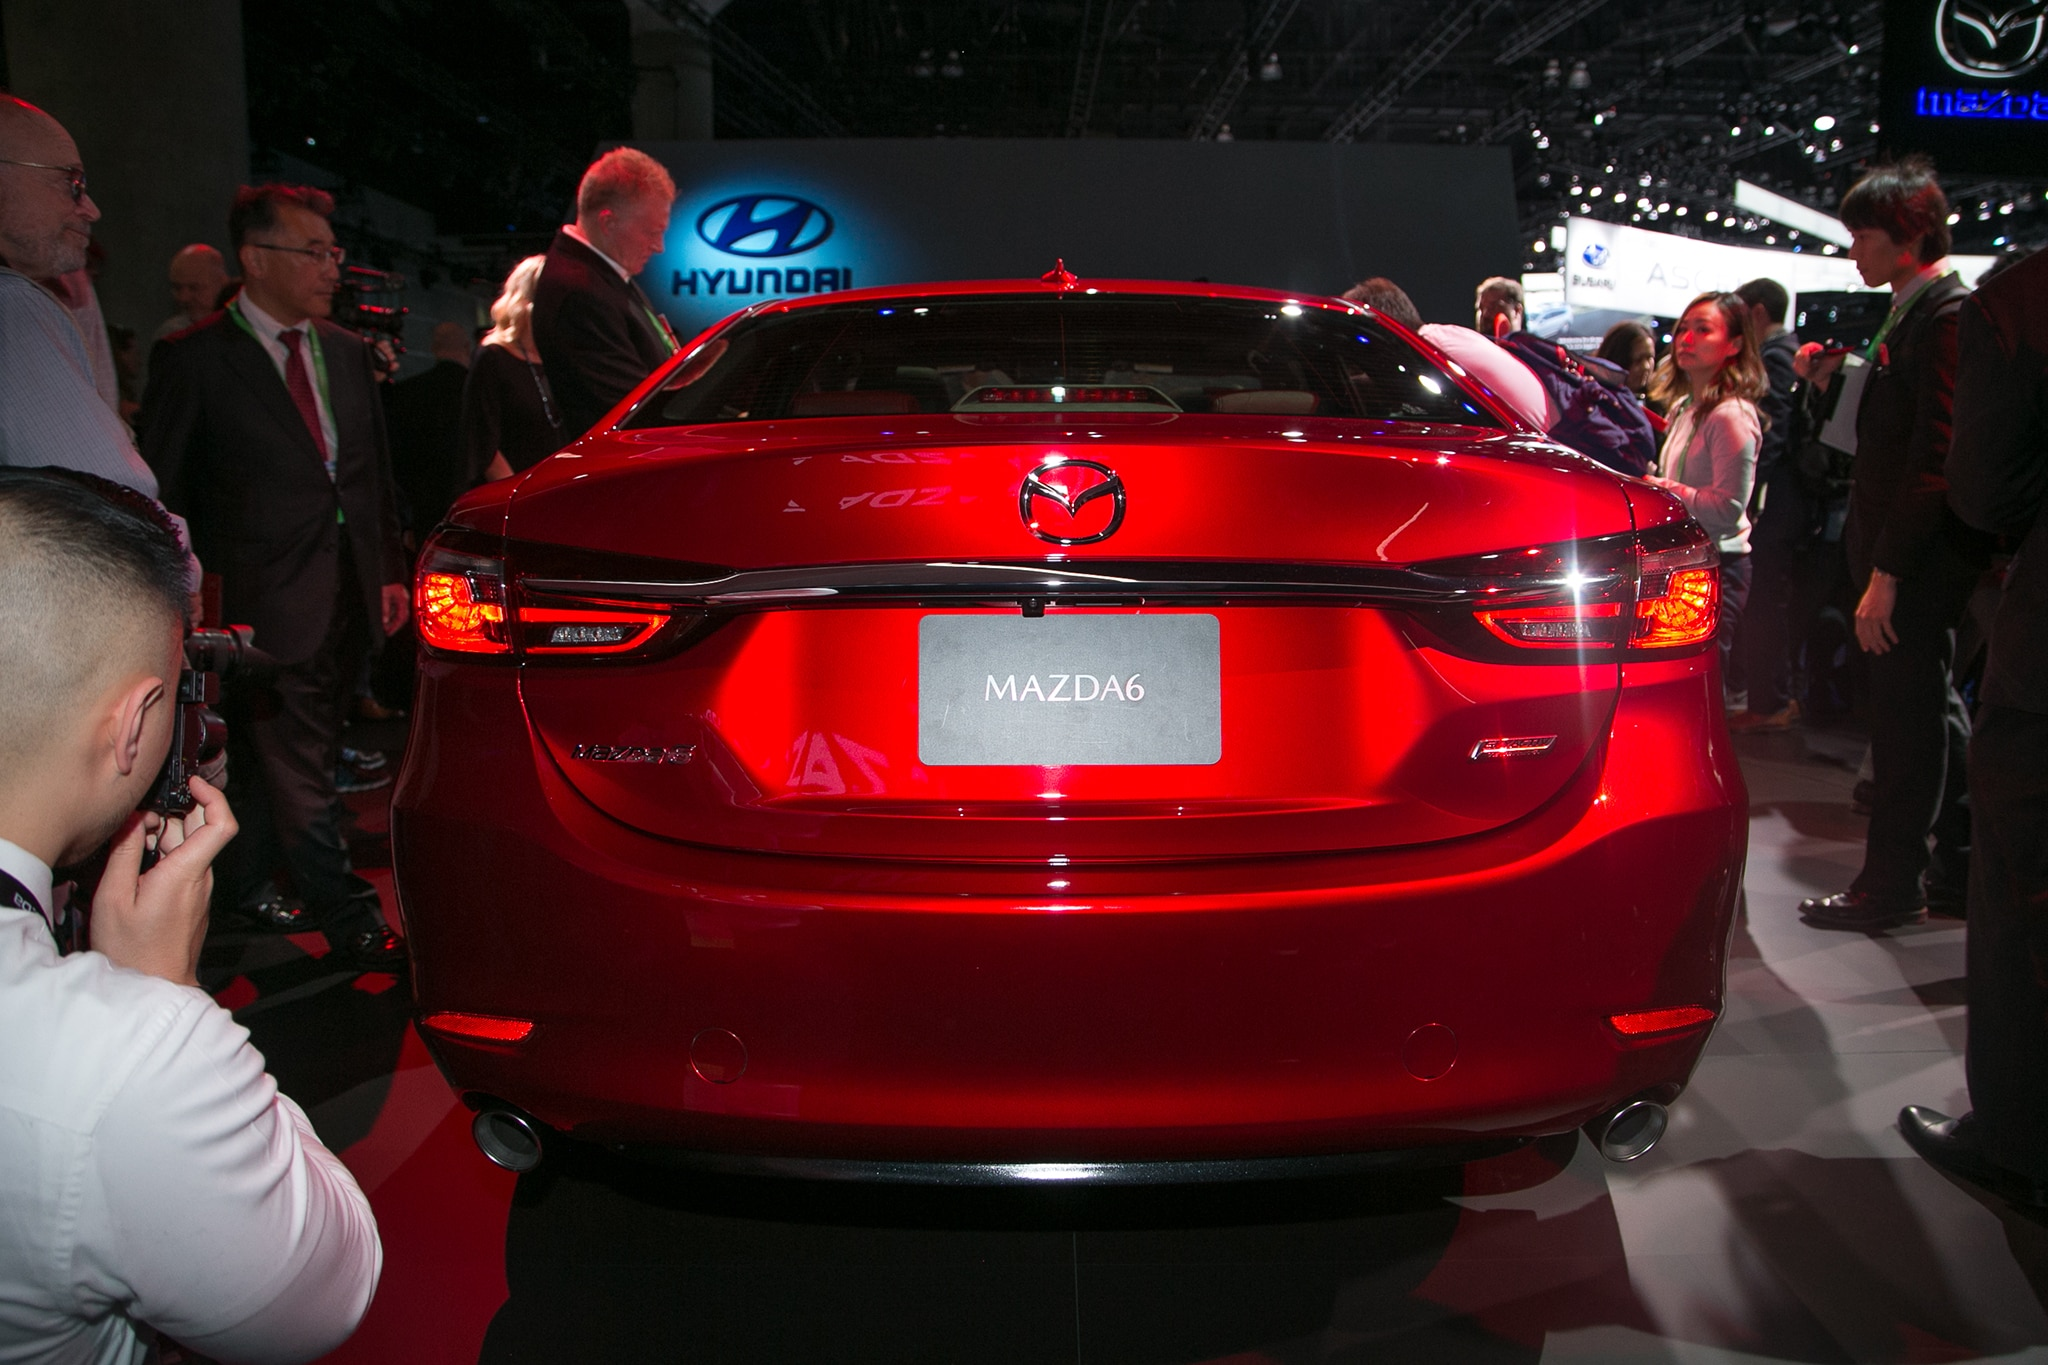 http://st.automobilemag.com/uploads/sites/5/2017/11/2018-Mazda6-rear.jpg